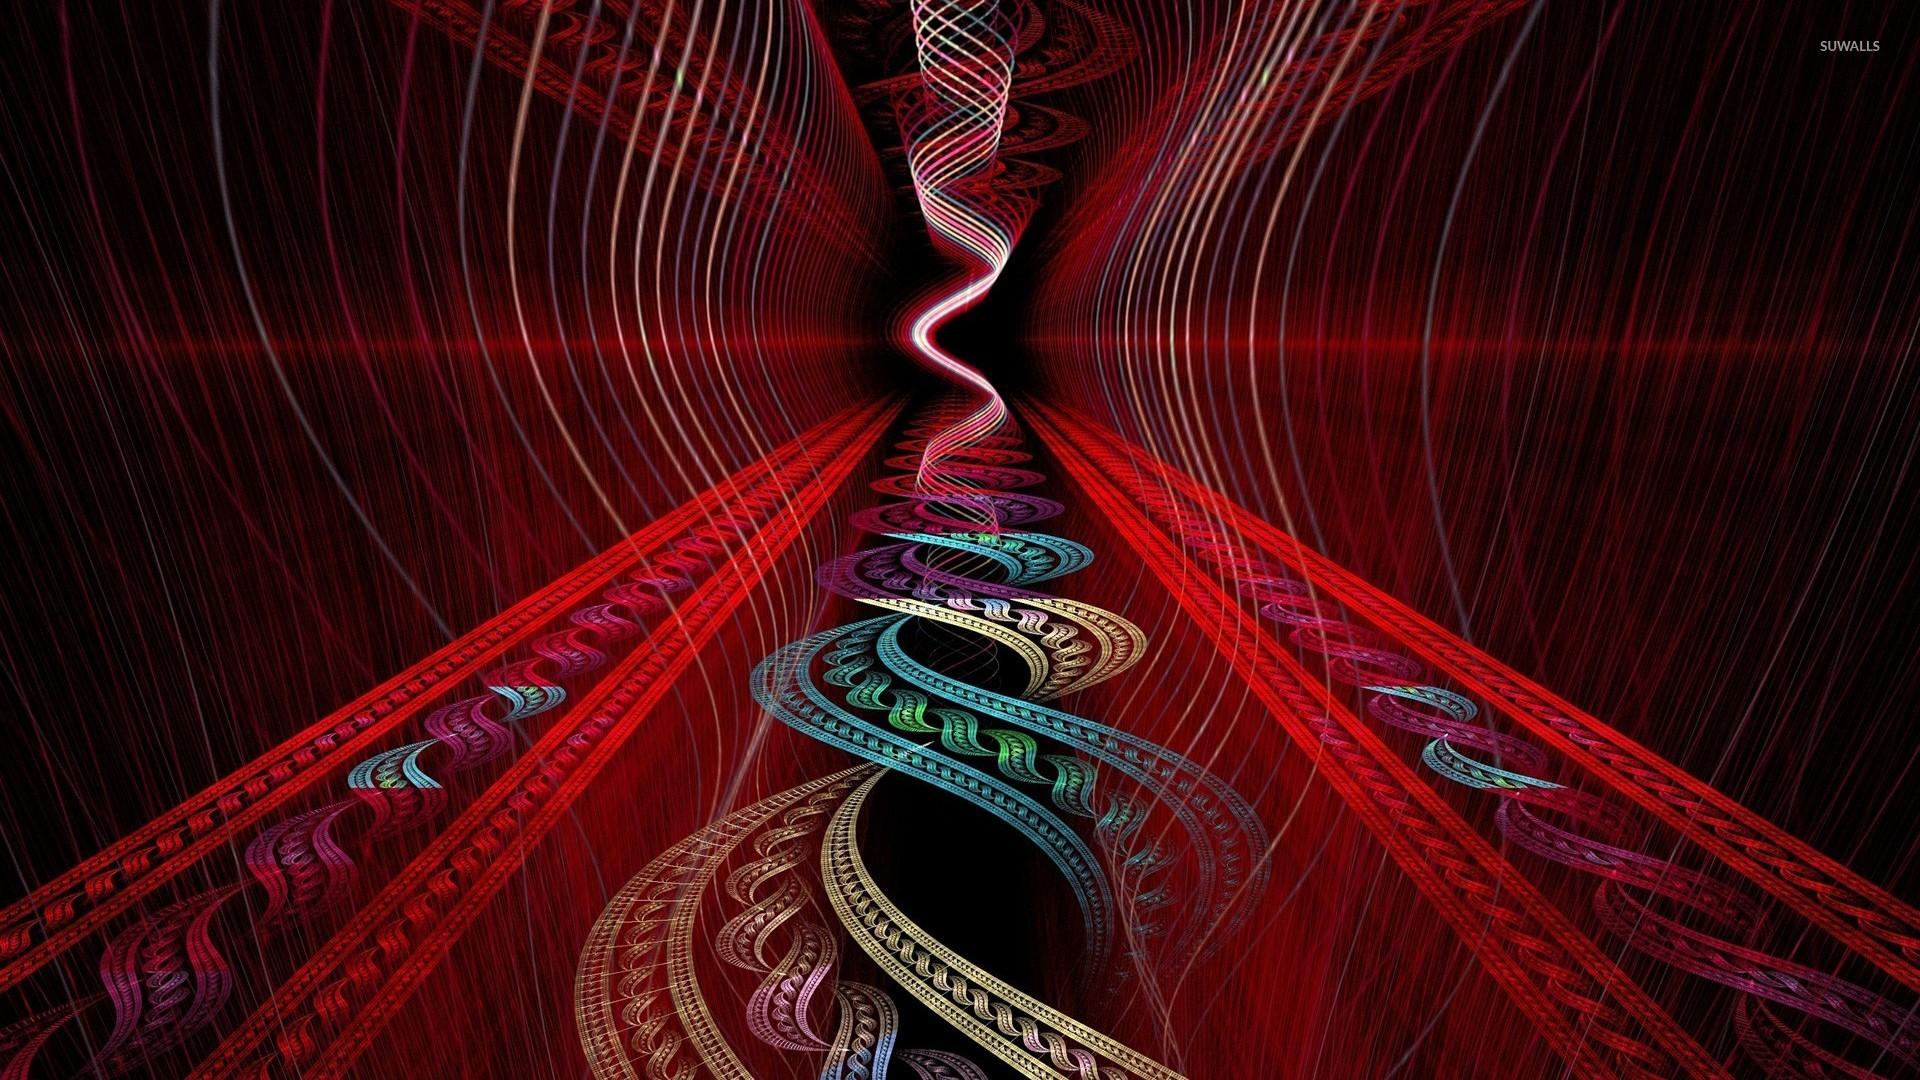 Tribal Pattern Wallpaper Hd Spiraling Fractal Wallpaper Abstract Wallpapers 25948